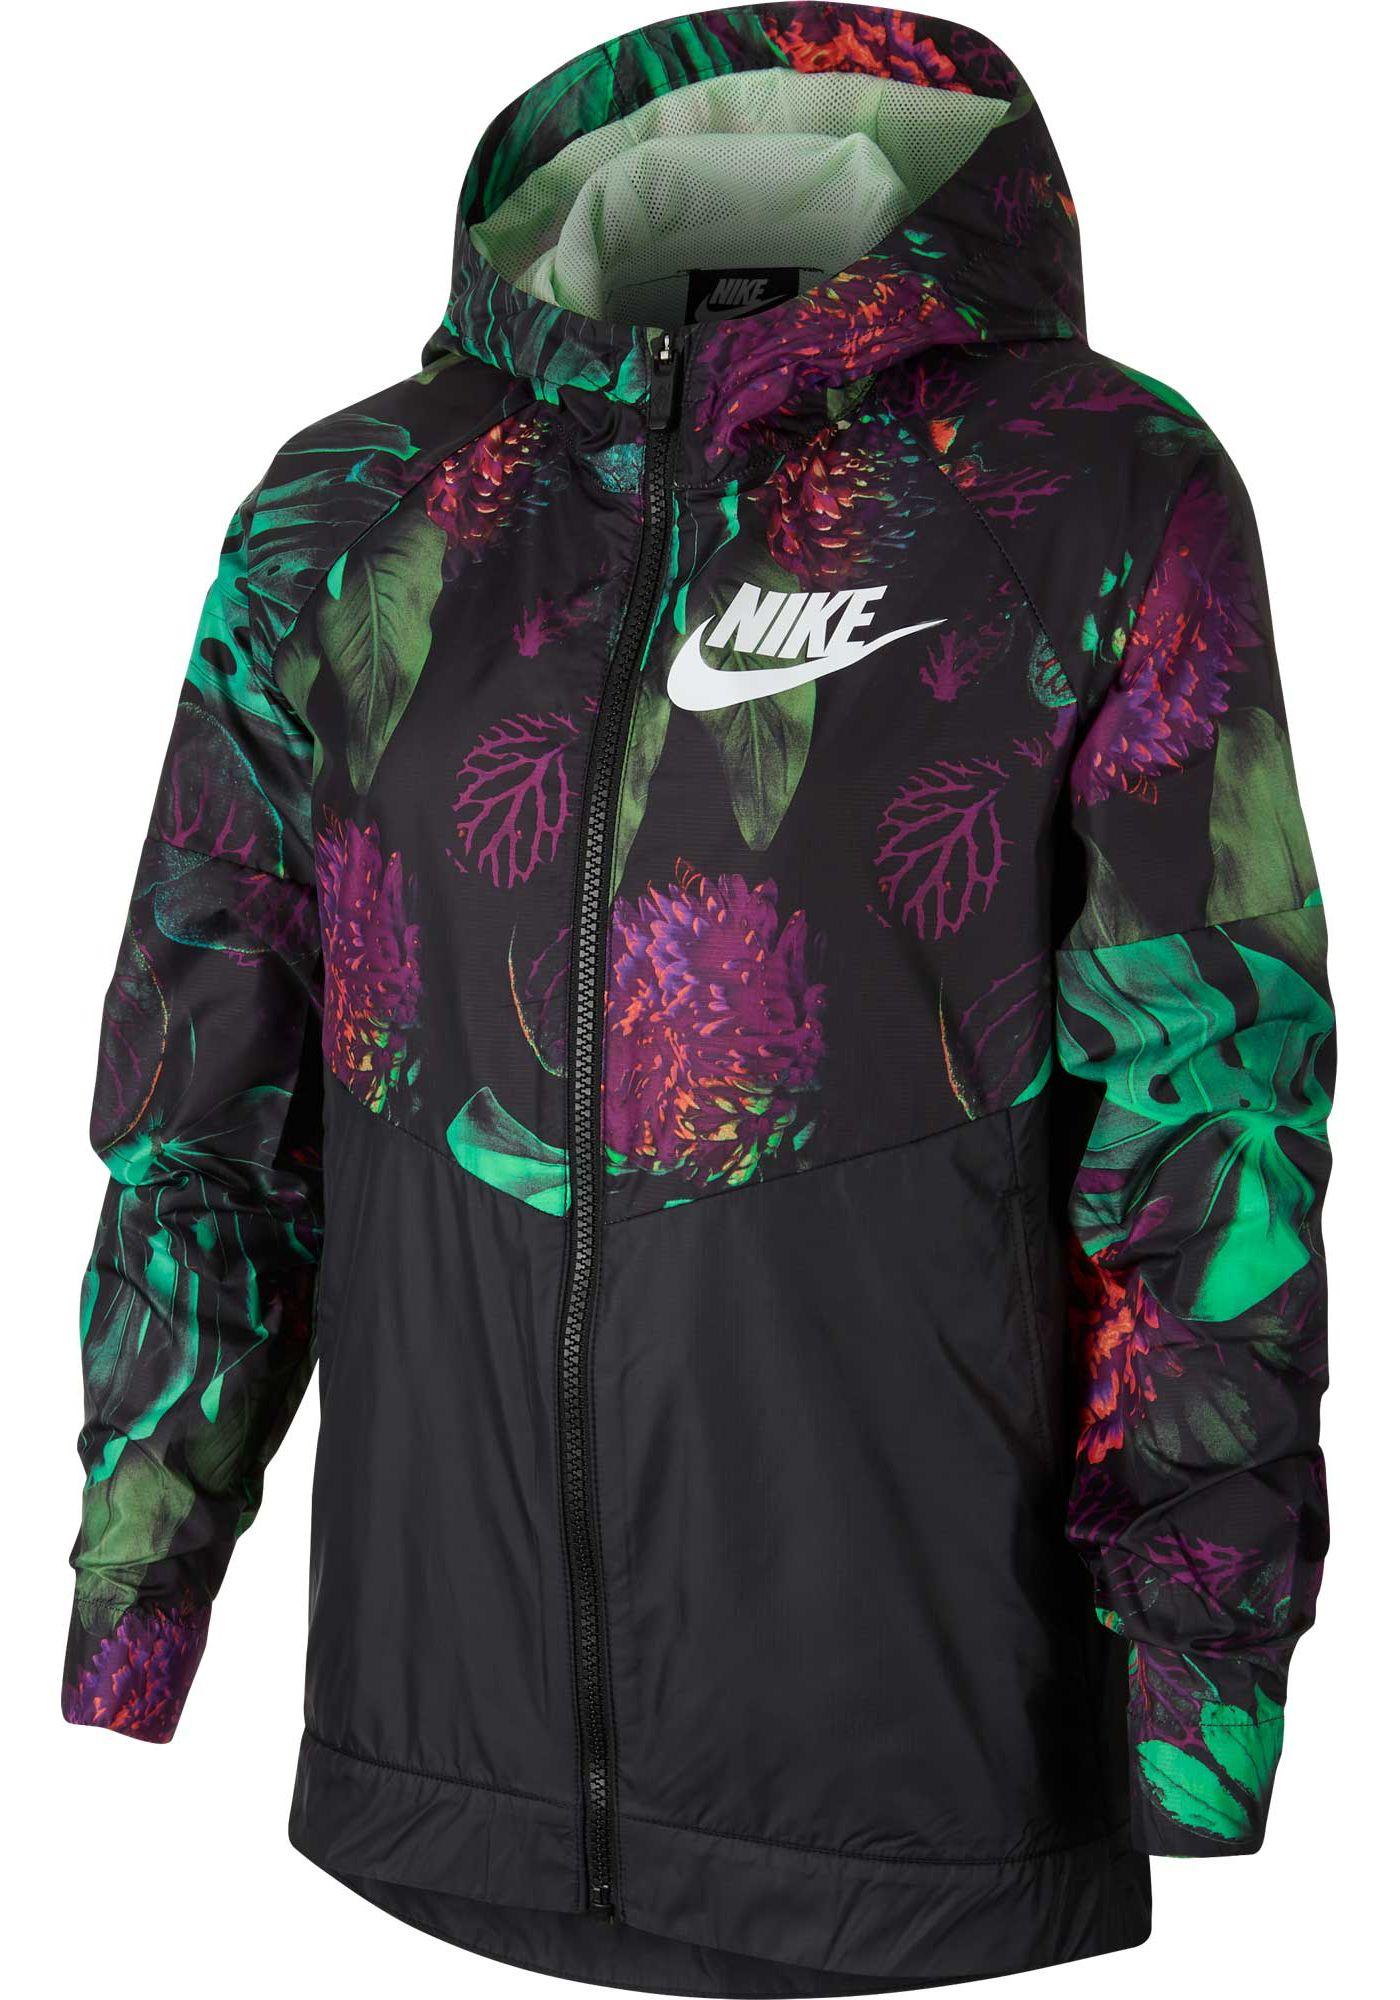 Nike Girls' Sportswear Printed Windrunner Jacket